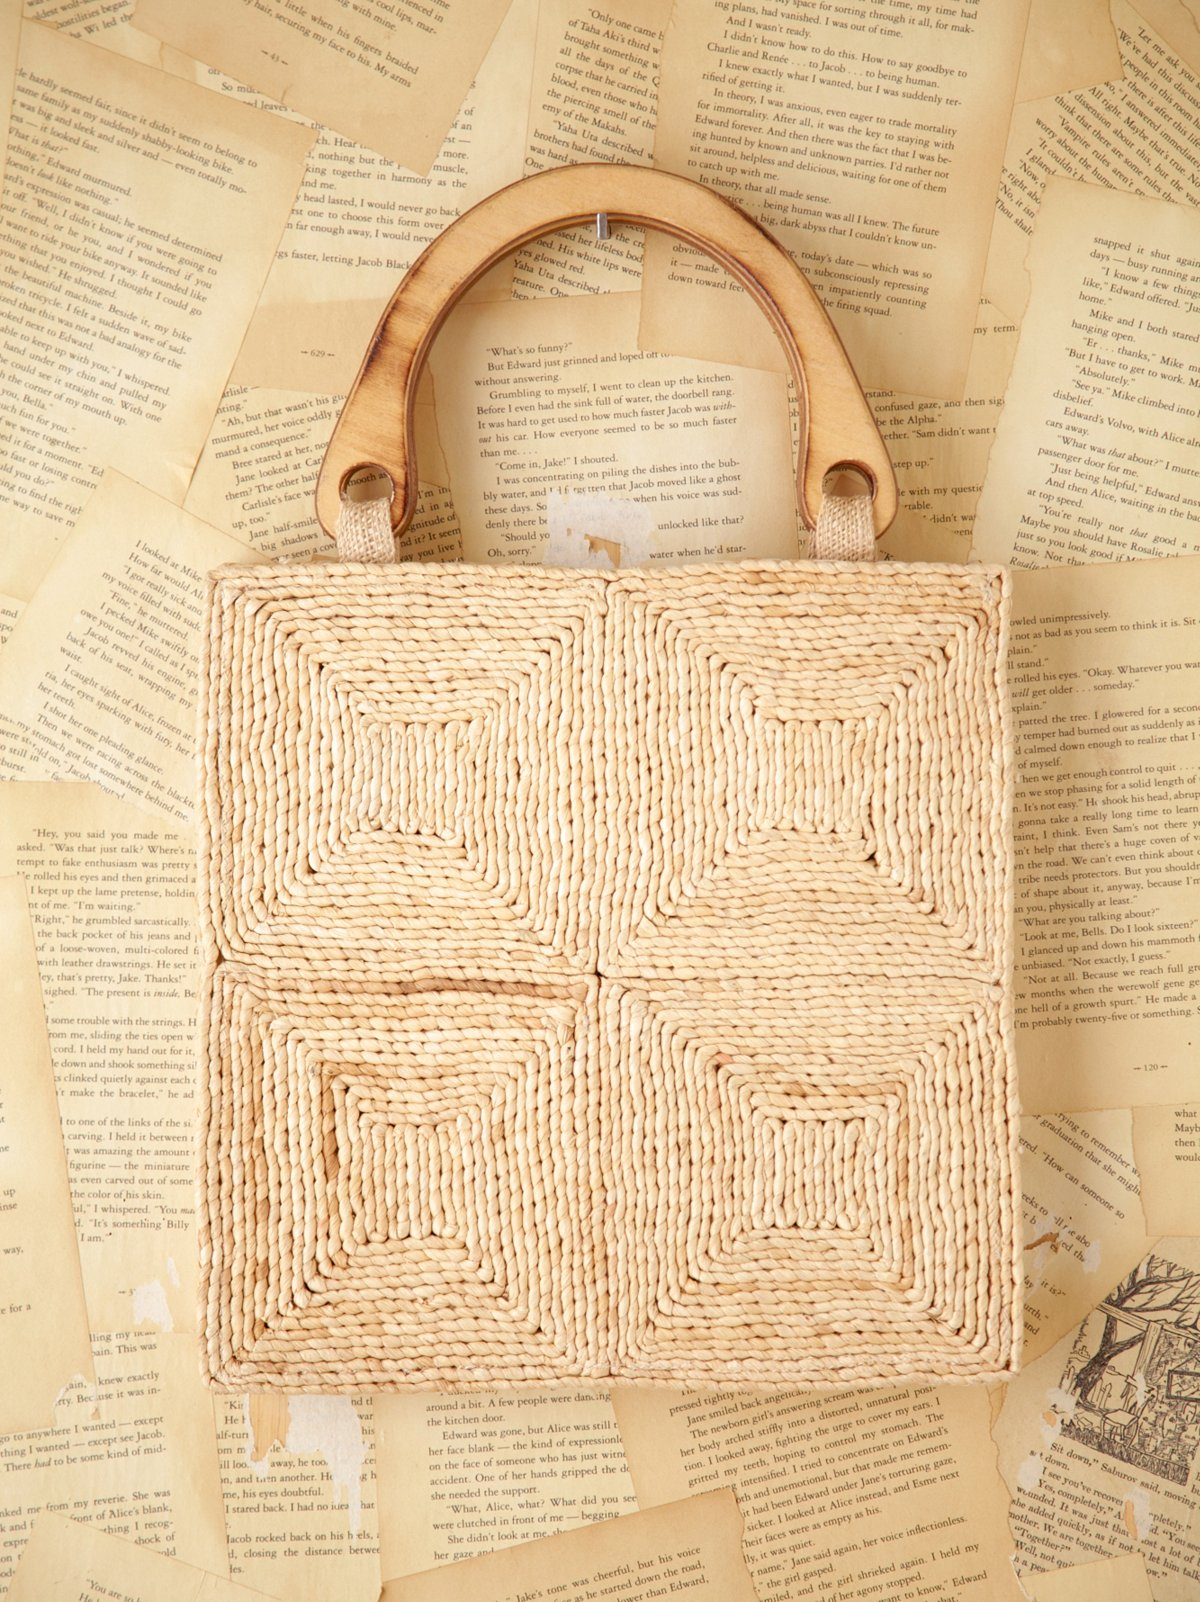 Vintage Square Straw Bag